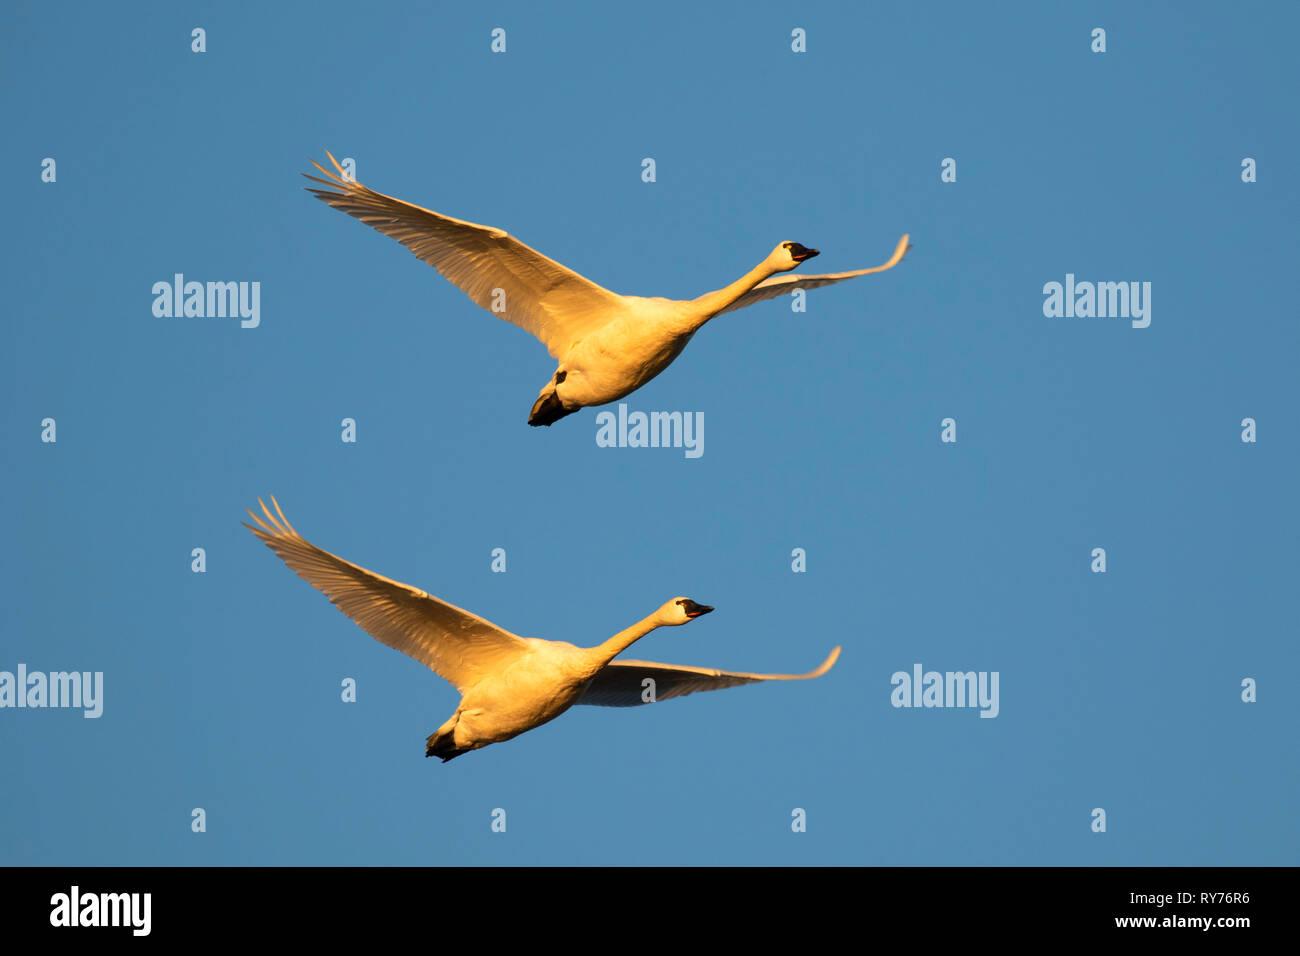 Tundra swan (Cygnus columbianus), Fir Island Farms Reserve, Skagit Wildlife Area, Washington Stock Photo